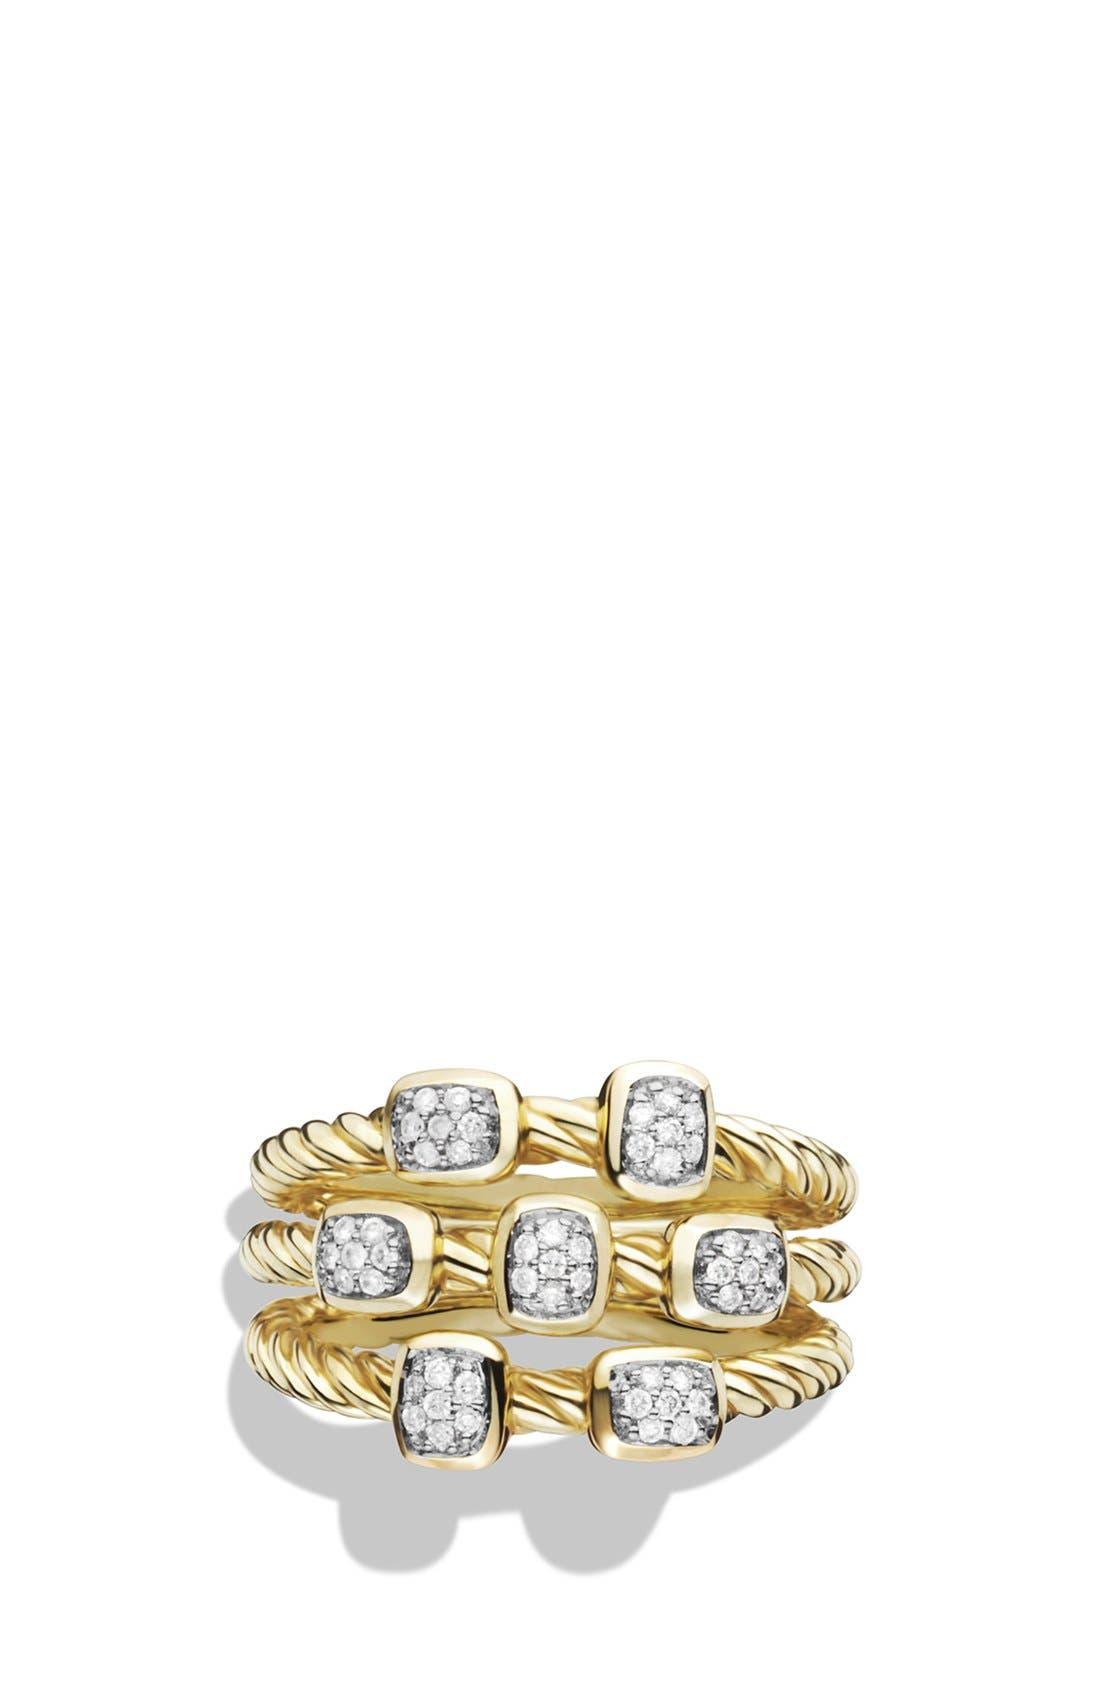 'Confetti' Ring with Diamonds in Gold,                             Alternate thumbnail 3, color,                             DIAMOND